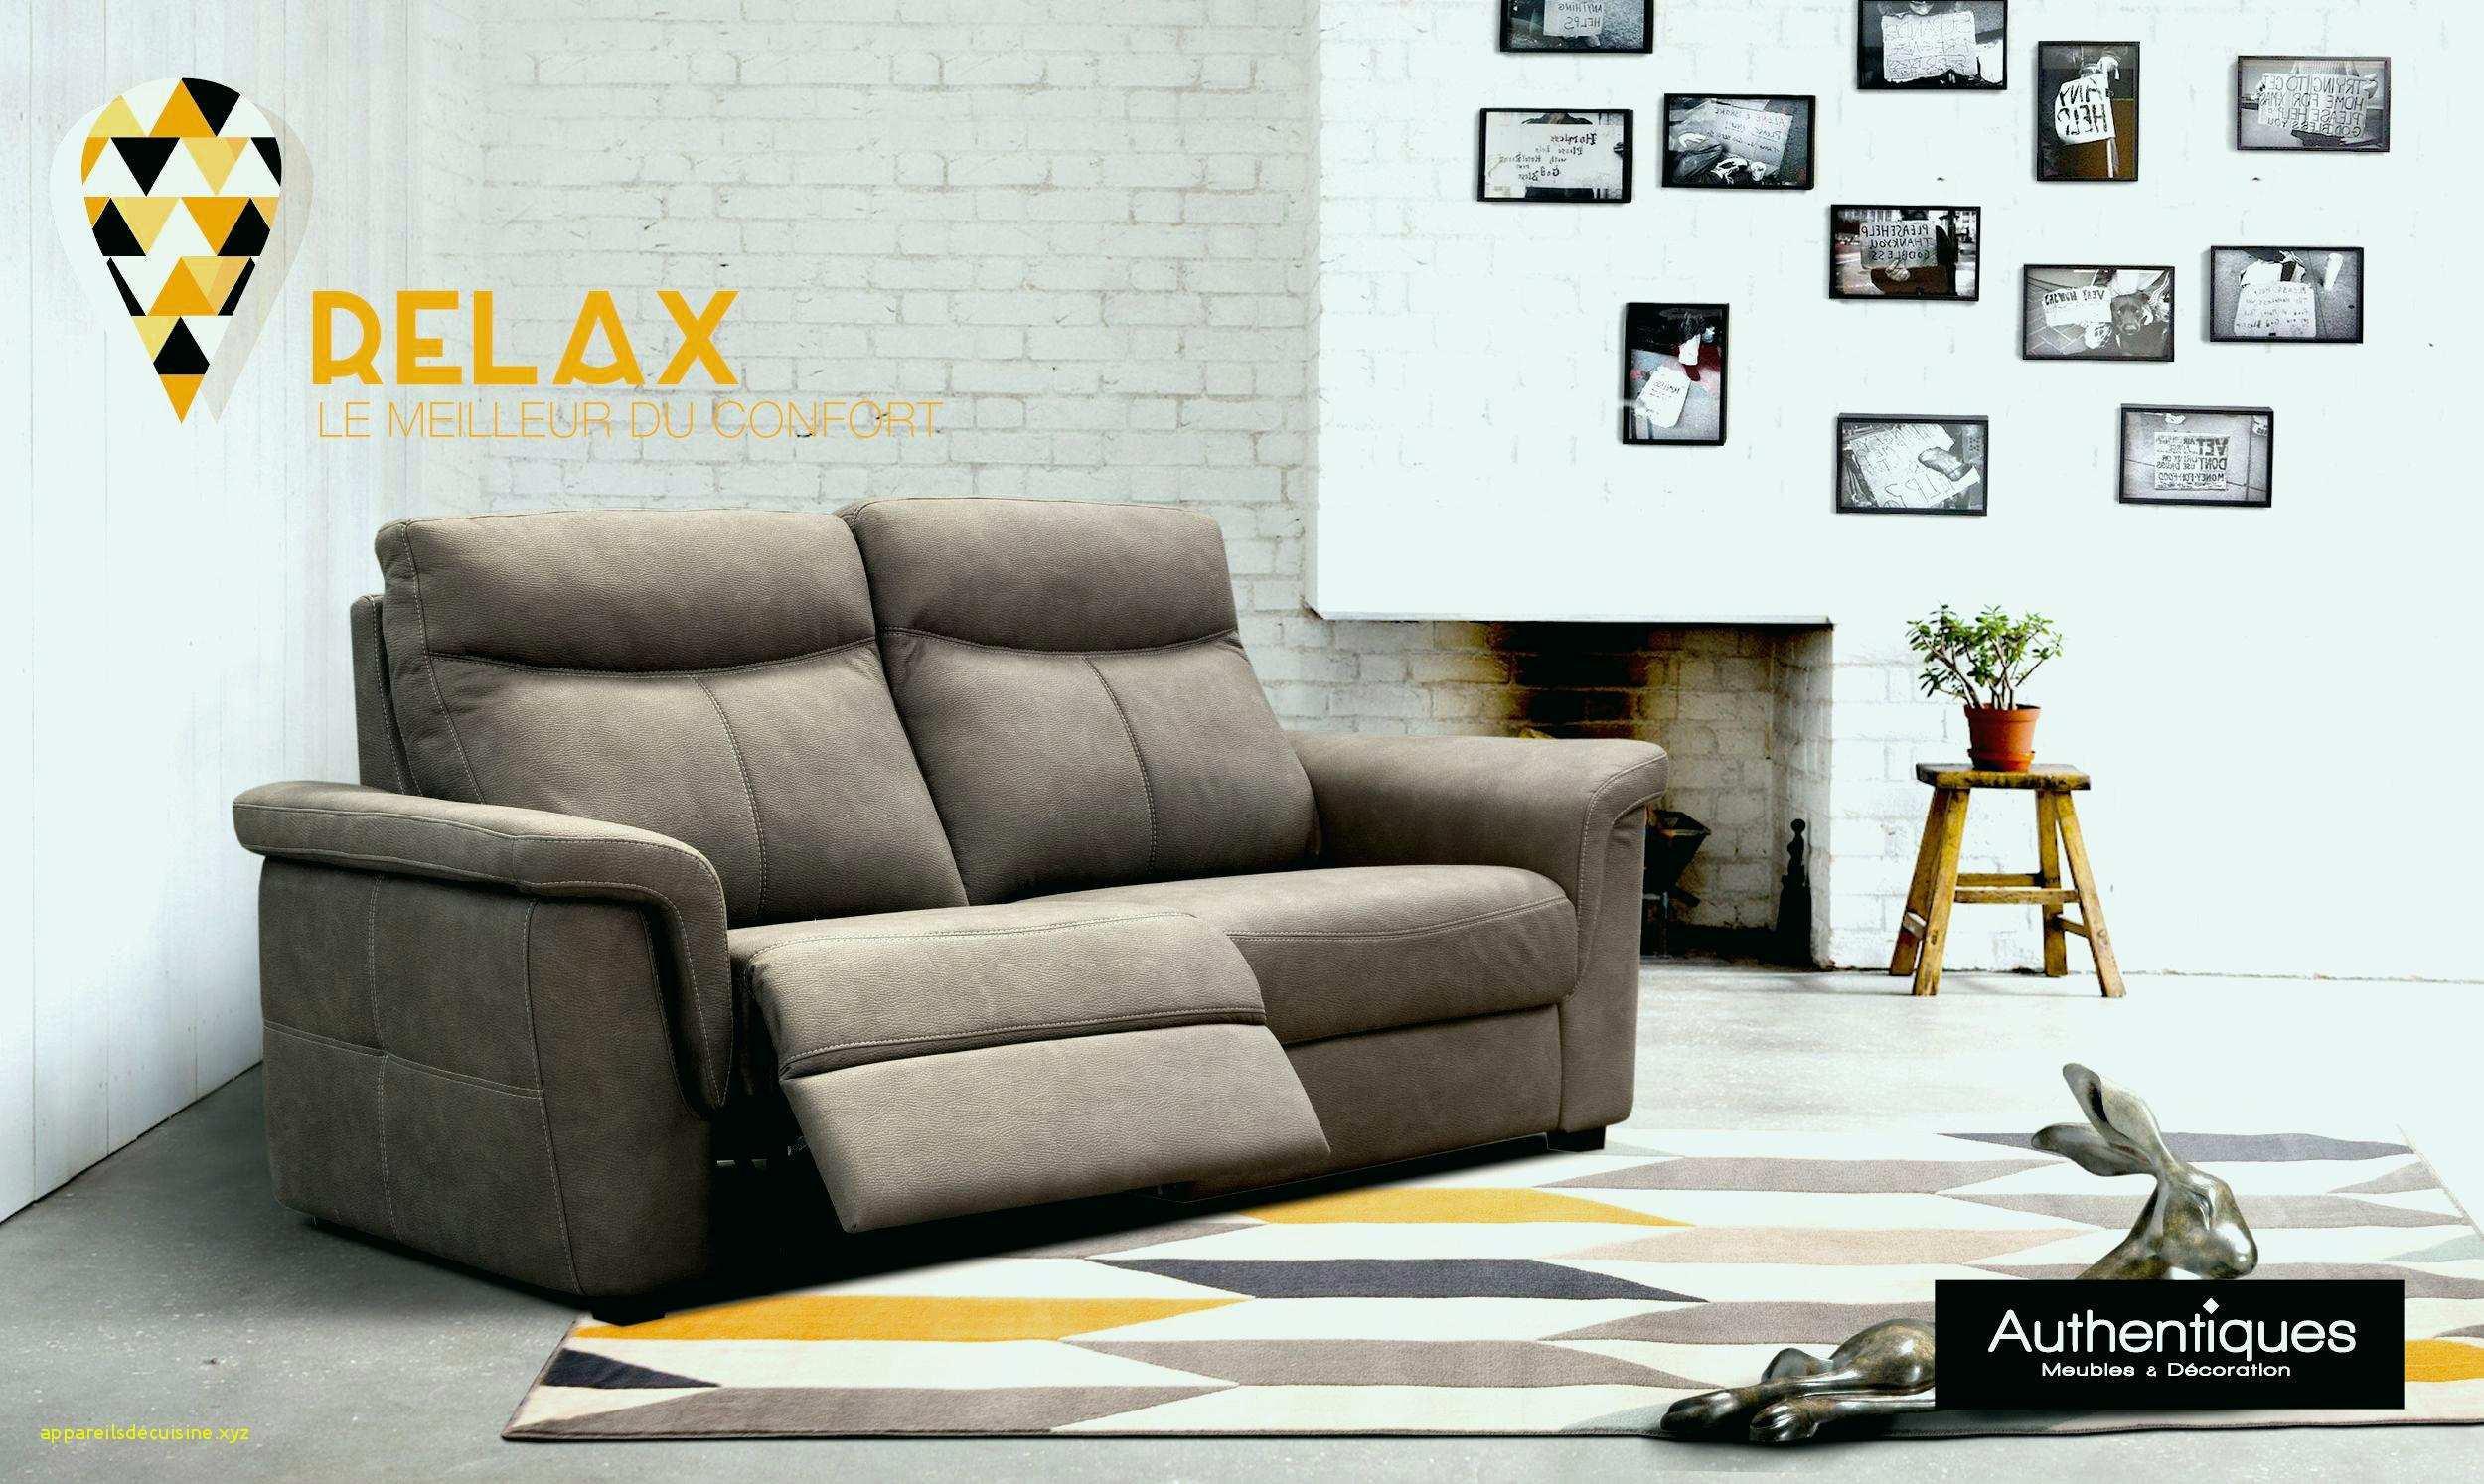 meilleur mezzo canape canape design gris luxe canape d angle but canape meri nne 0d design idees inspirantes